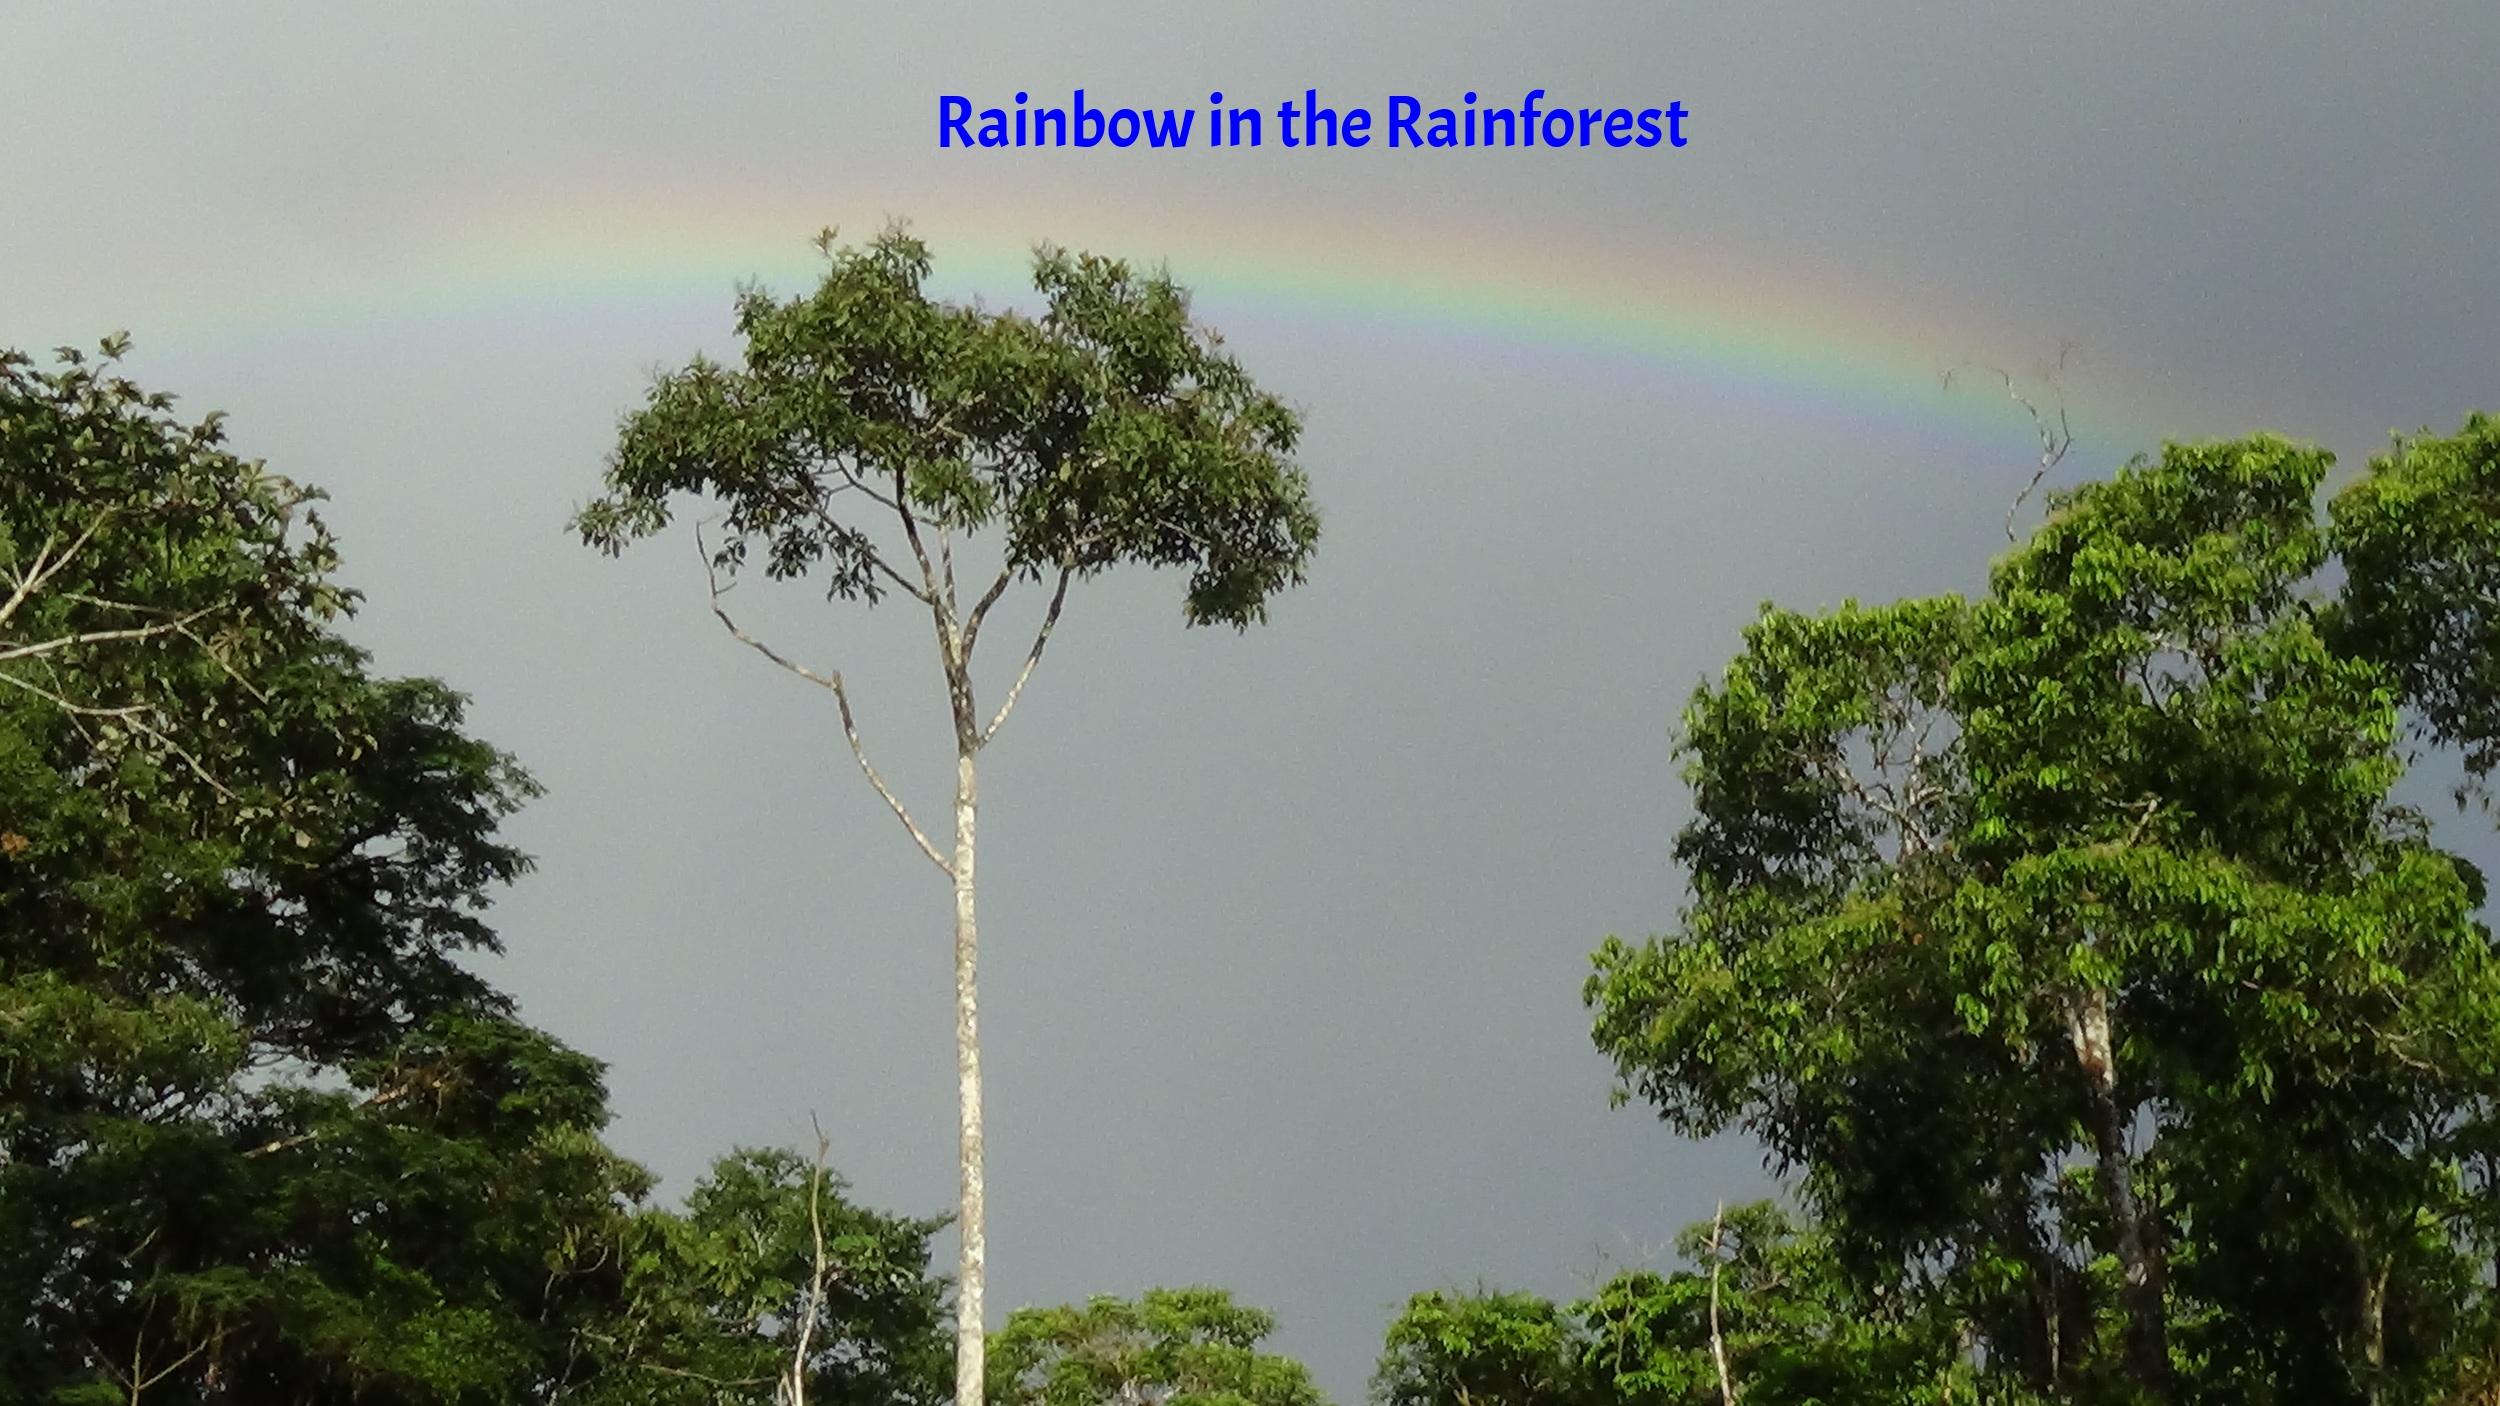 Rainbow in the rainforest